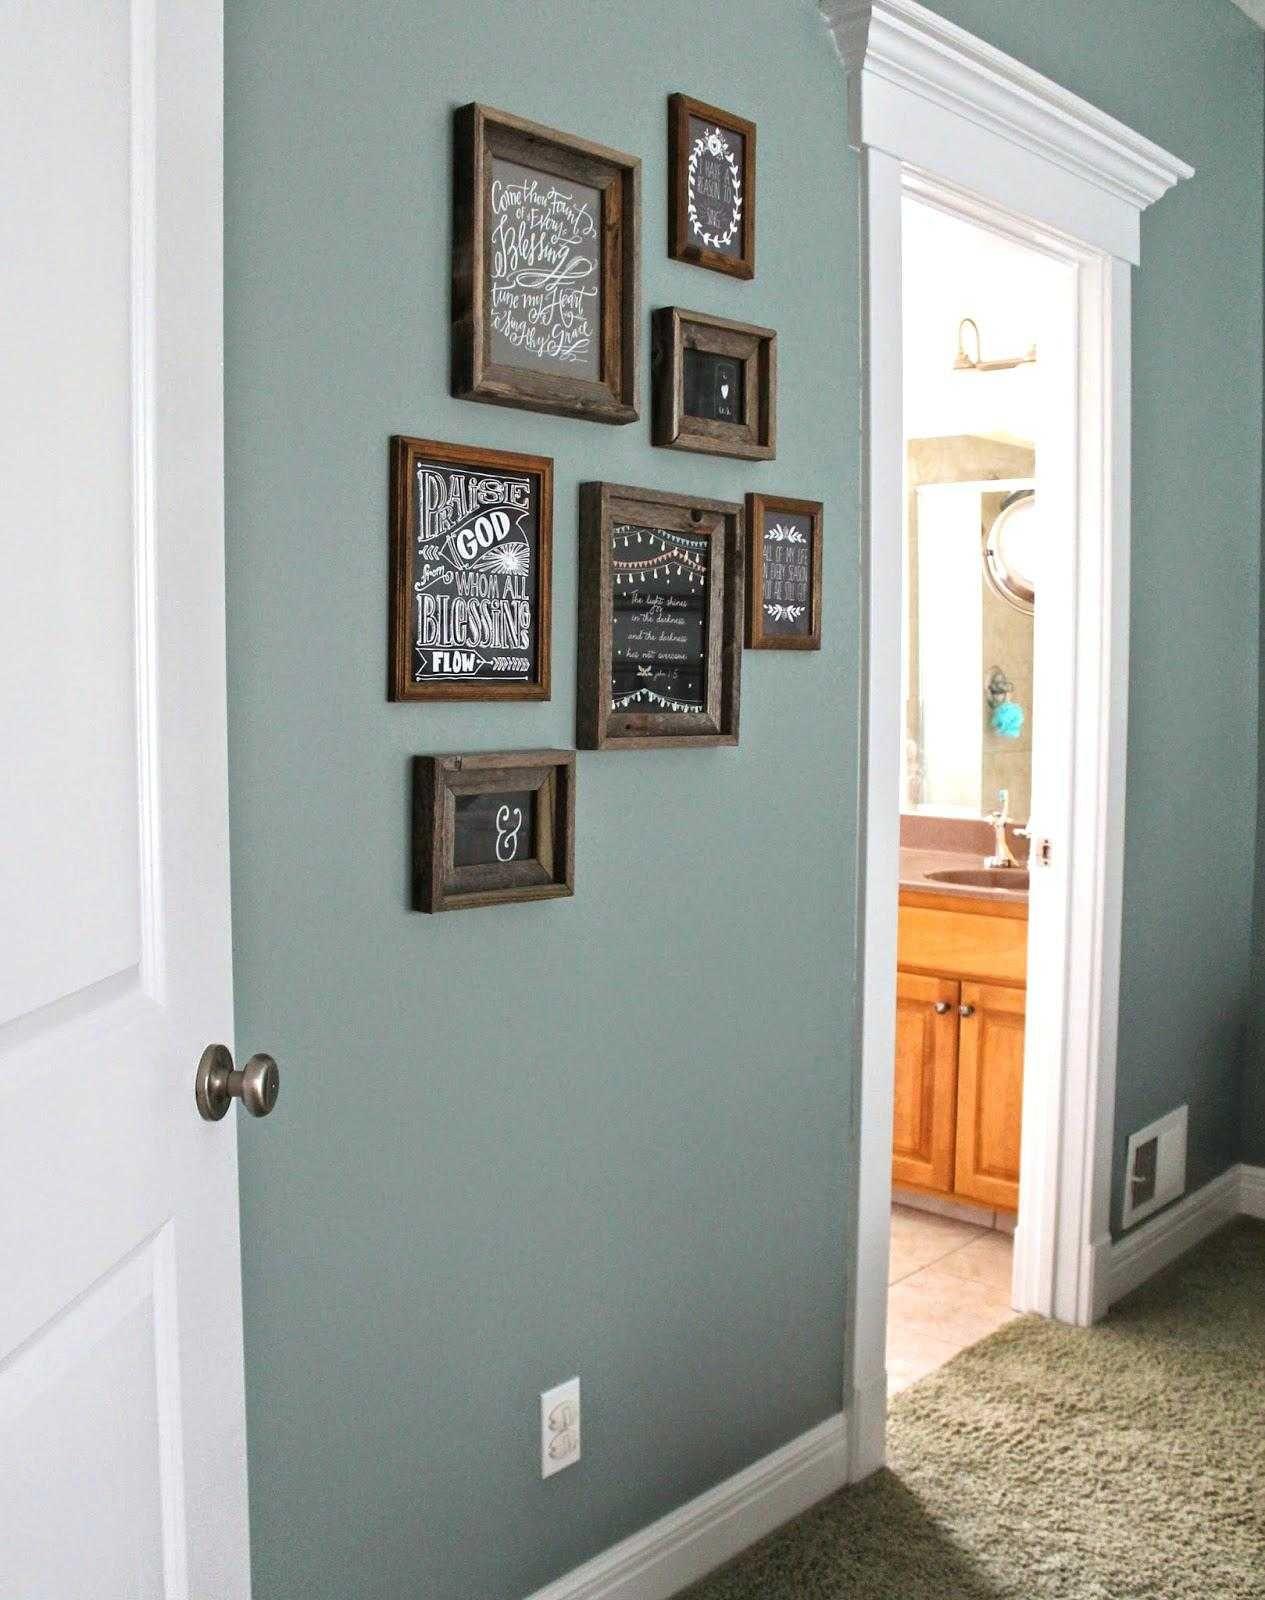 Valspar Paint Colors For Bedrooms Ace Green Gray 2018 And Paint Colors For Living Room Hallway Paint Hallway Paint Colors